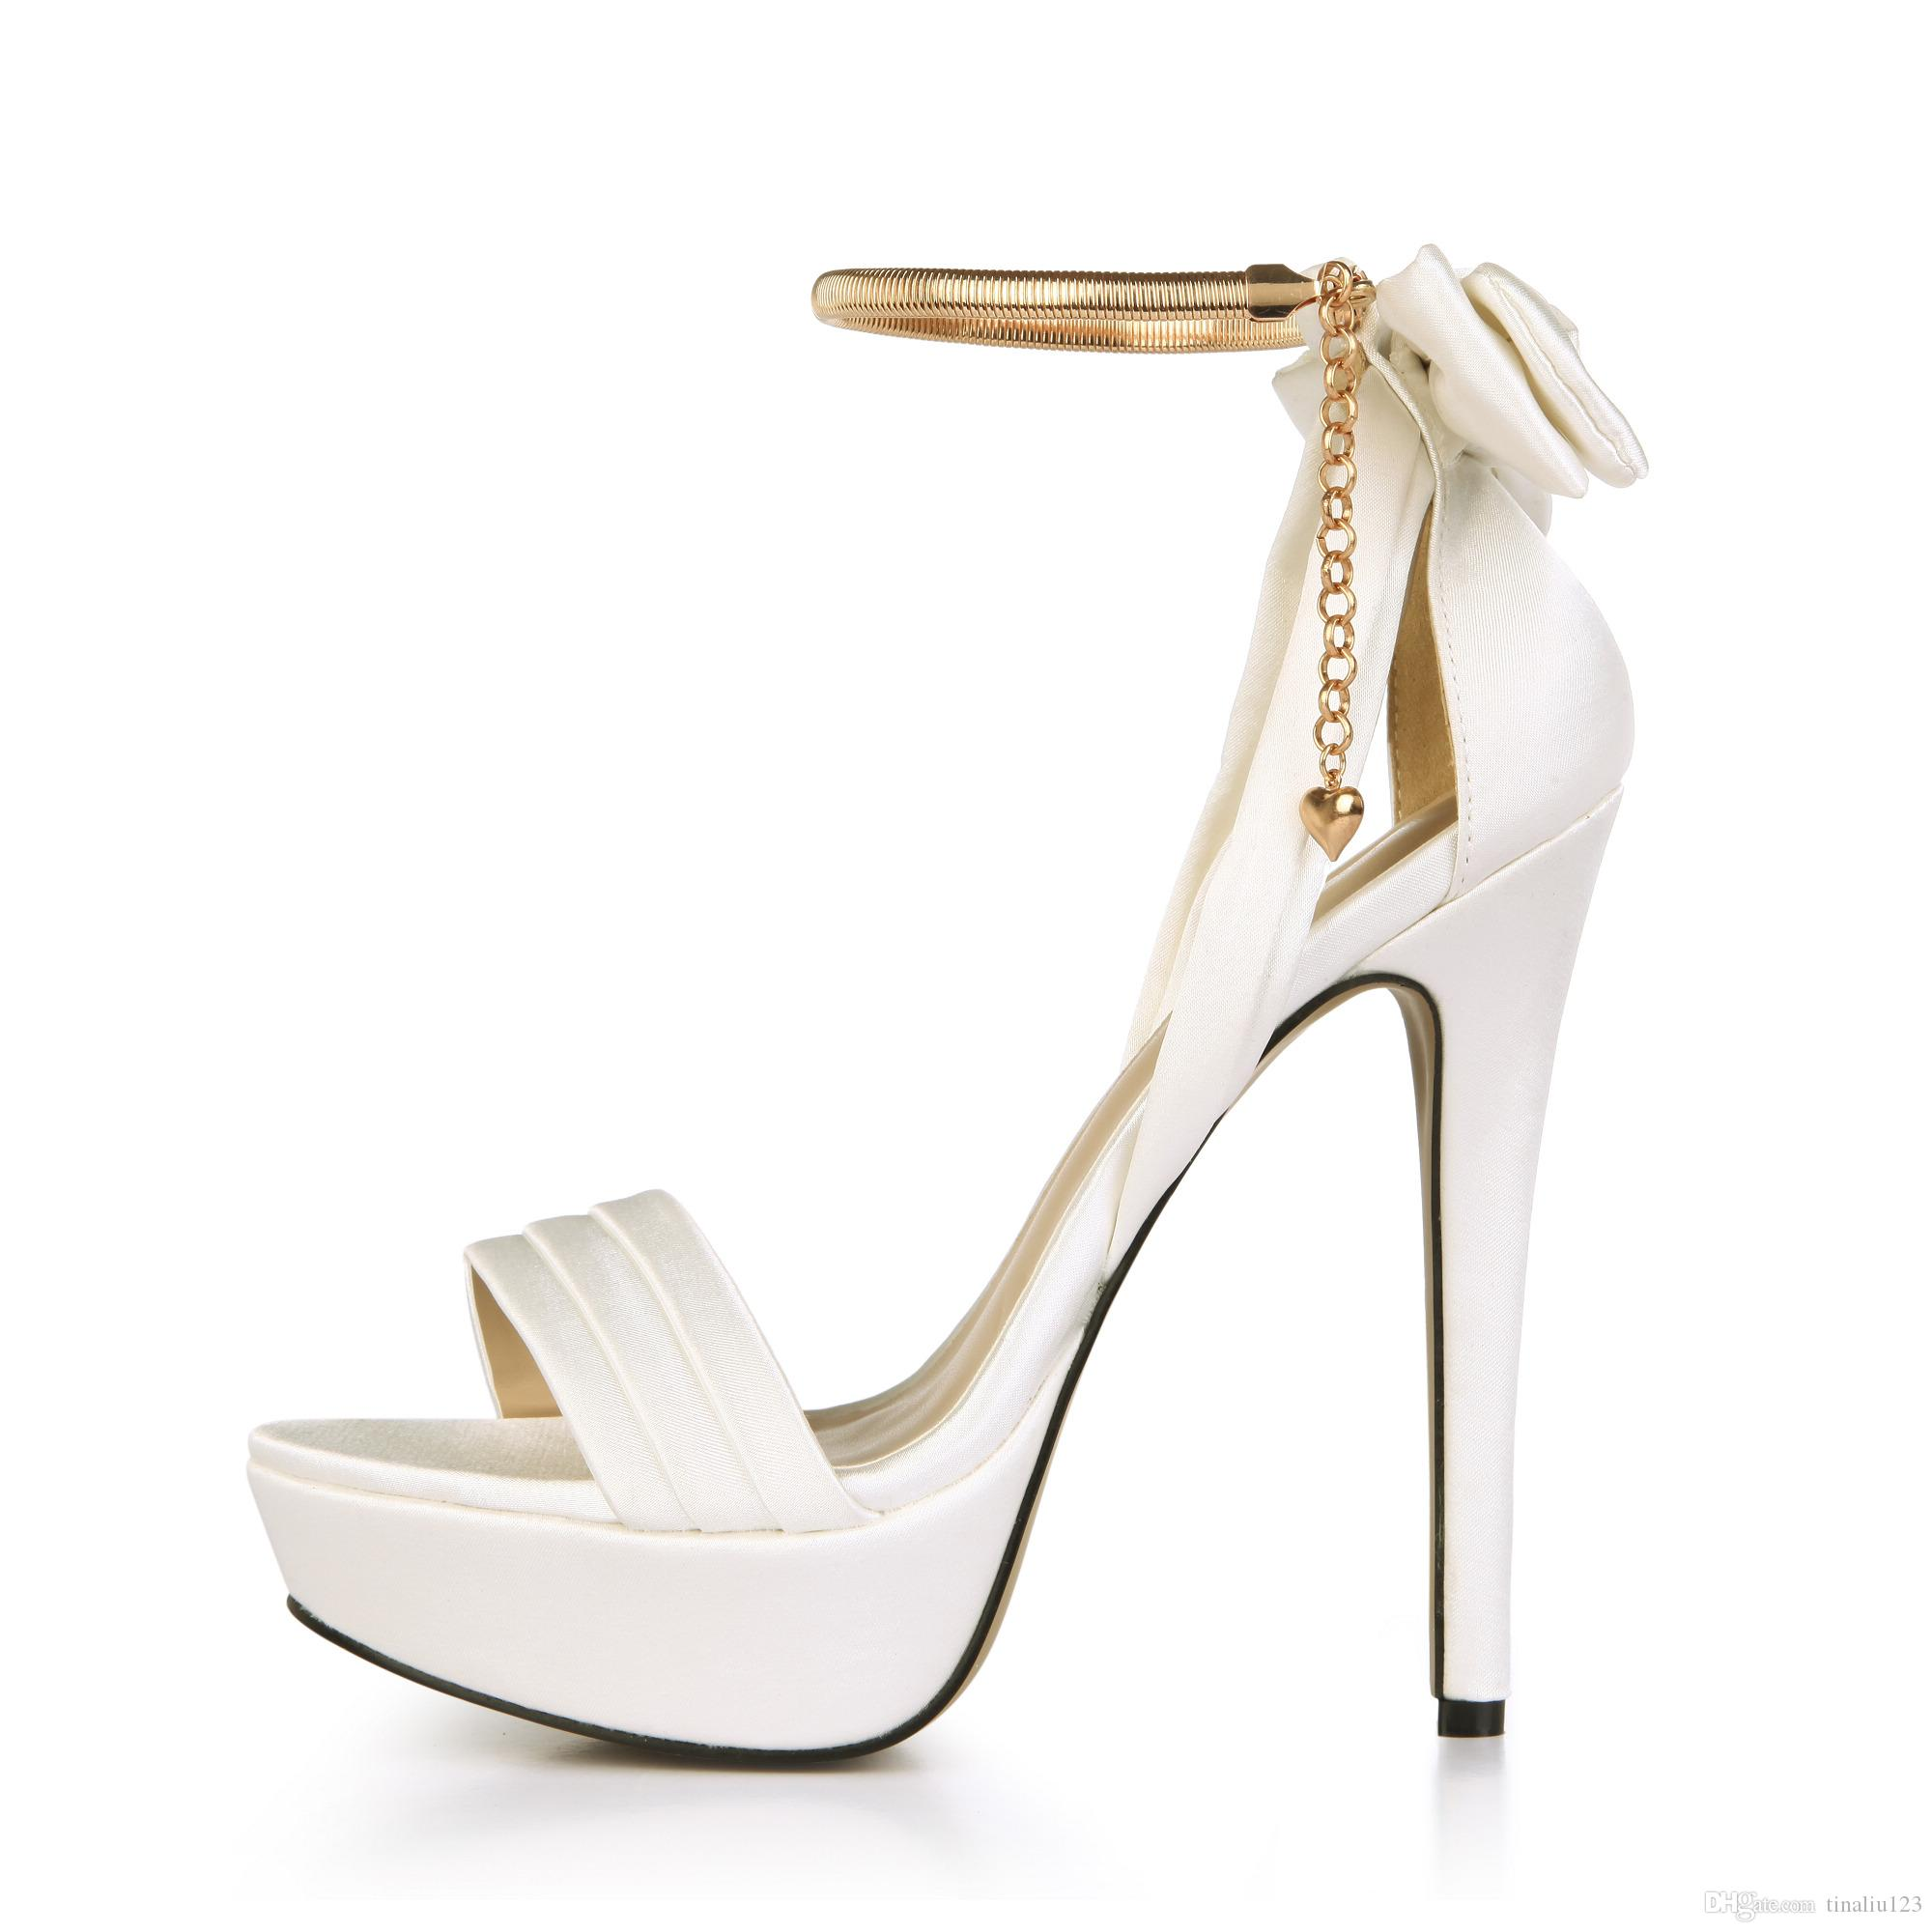 New Elegant Women High Heel Platform Sandals Fashion Bow Thin Heels  Sandalias High Quality Satin Party Wedding Dress Shoes Mujer Sandalias Boys  Sandals ... b0bd8486c4ec